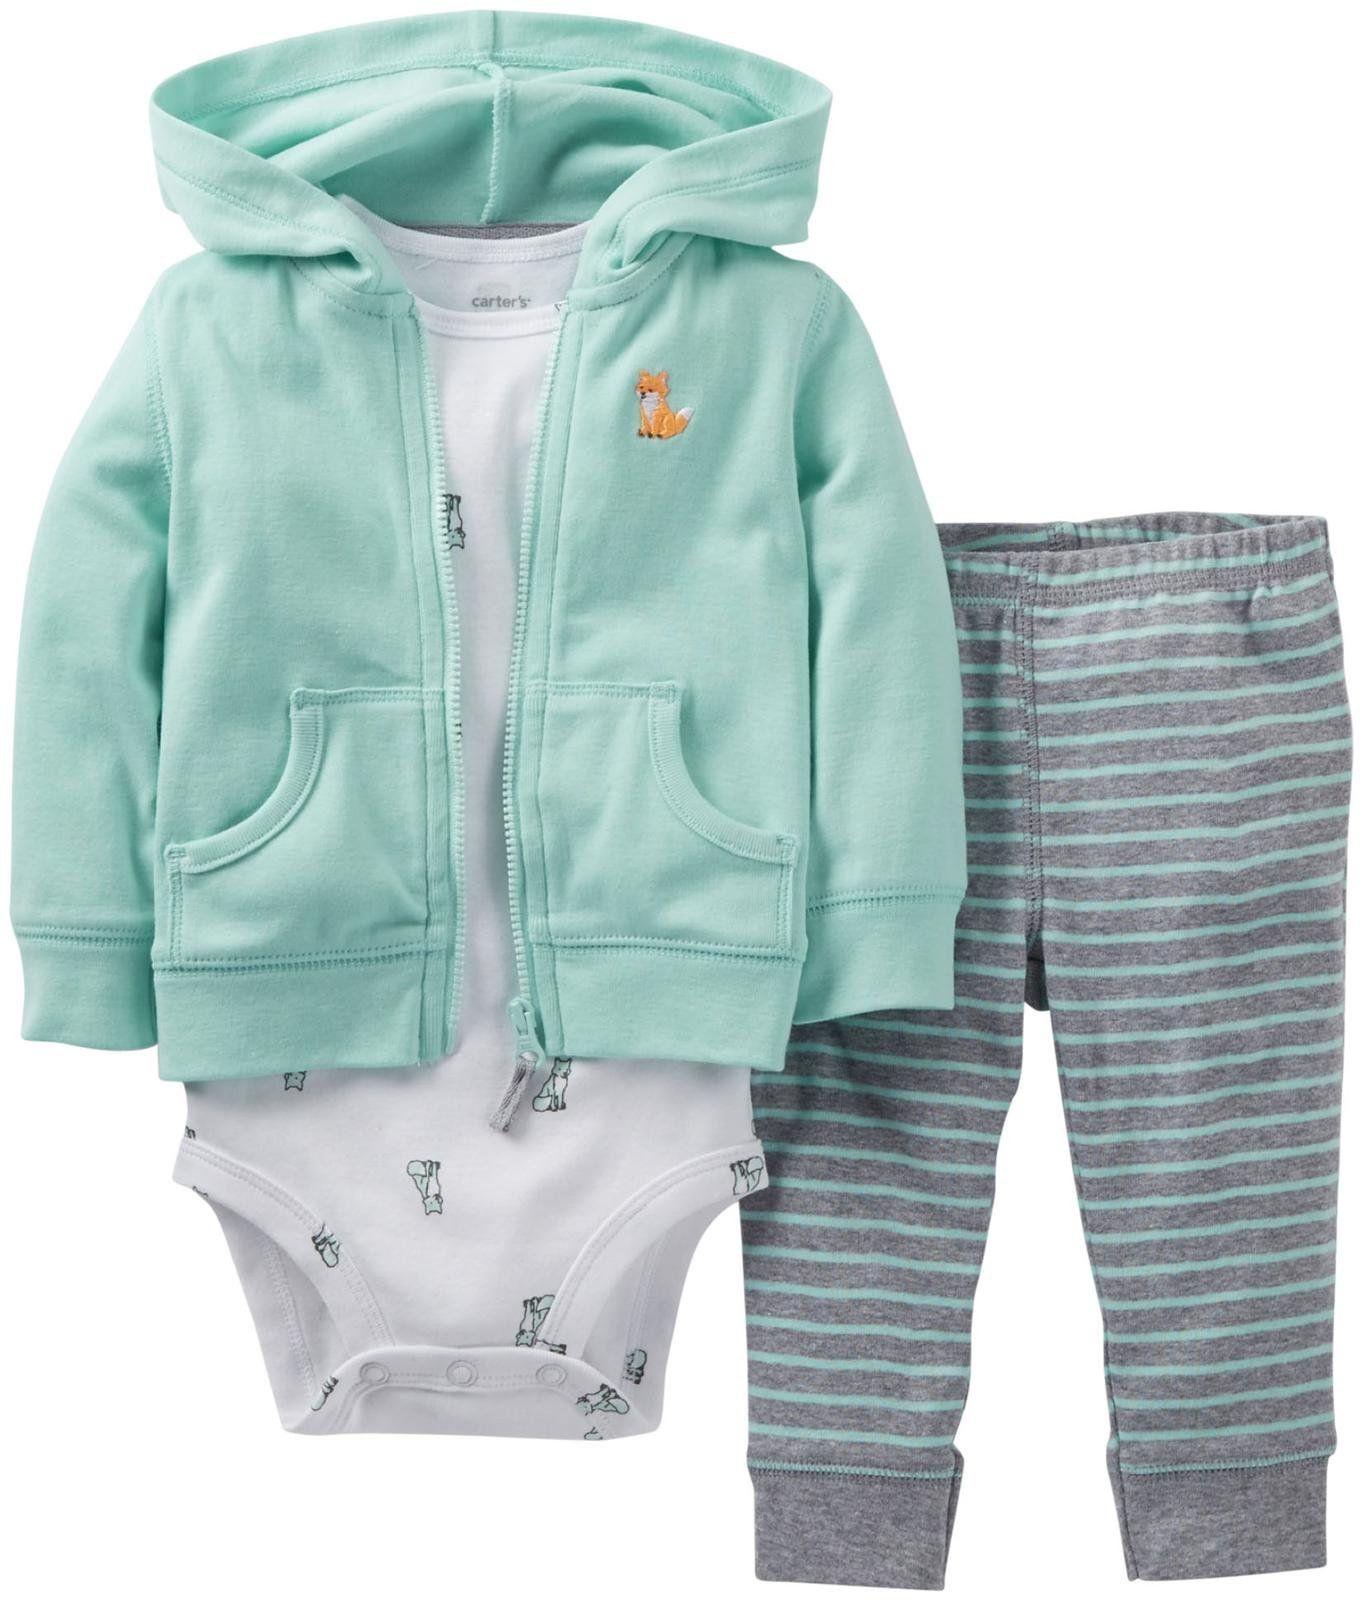 0655ad26a4ae Amazon.com  Carter s Baby Boys  3 Piece Cardigan Set (Baby) - Mint ...